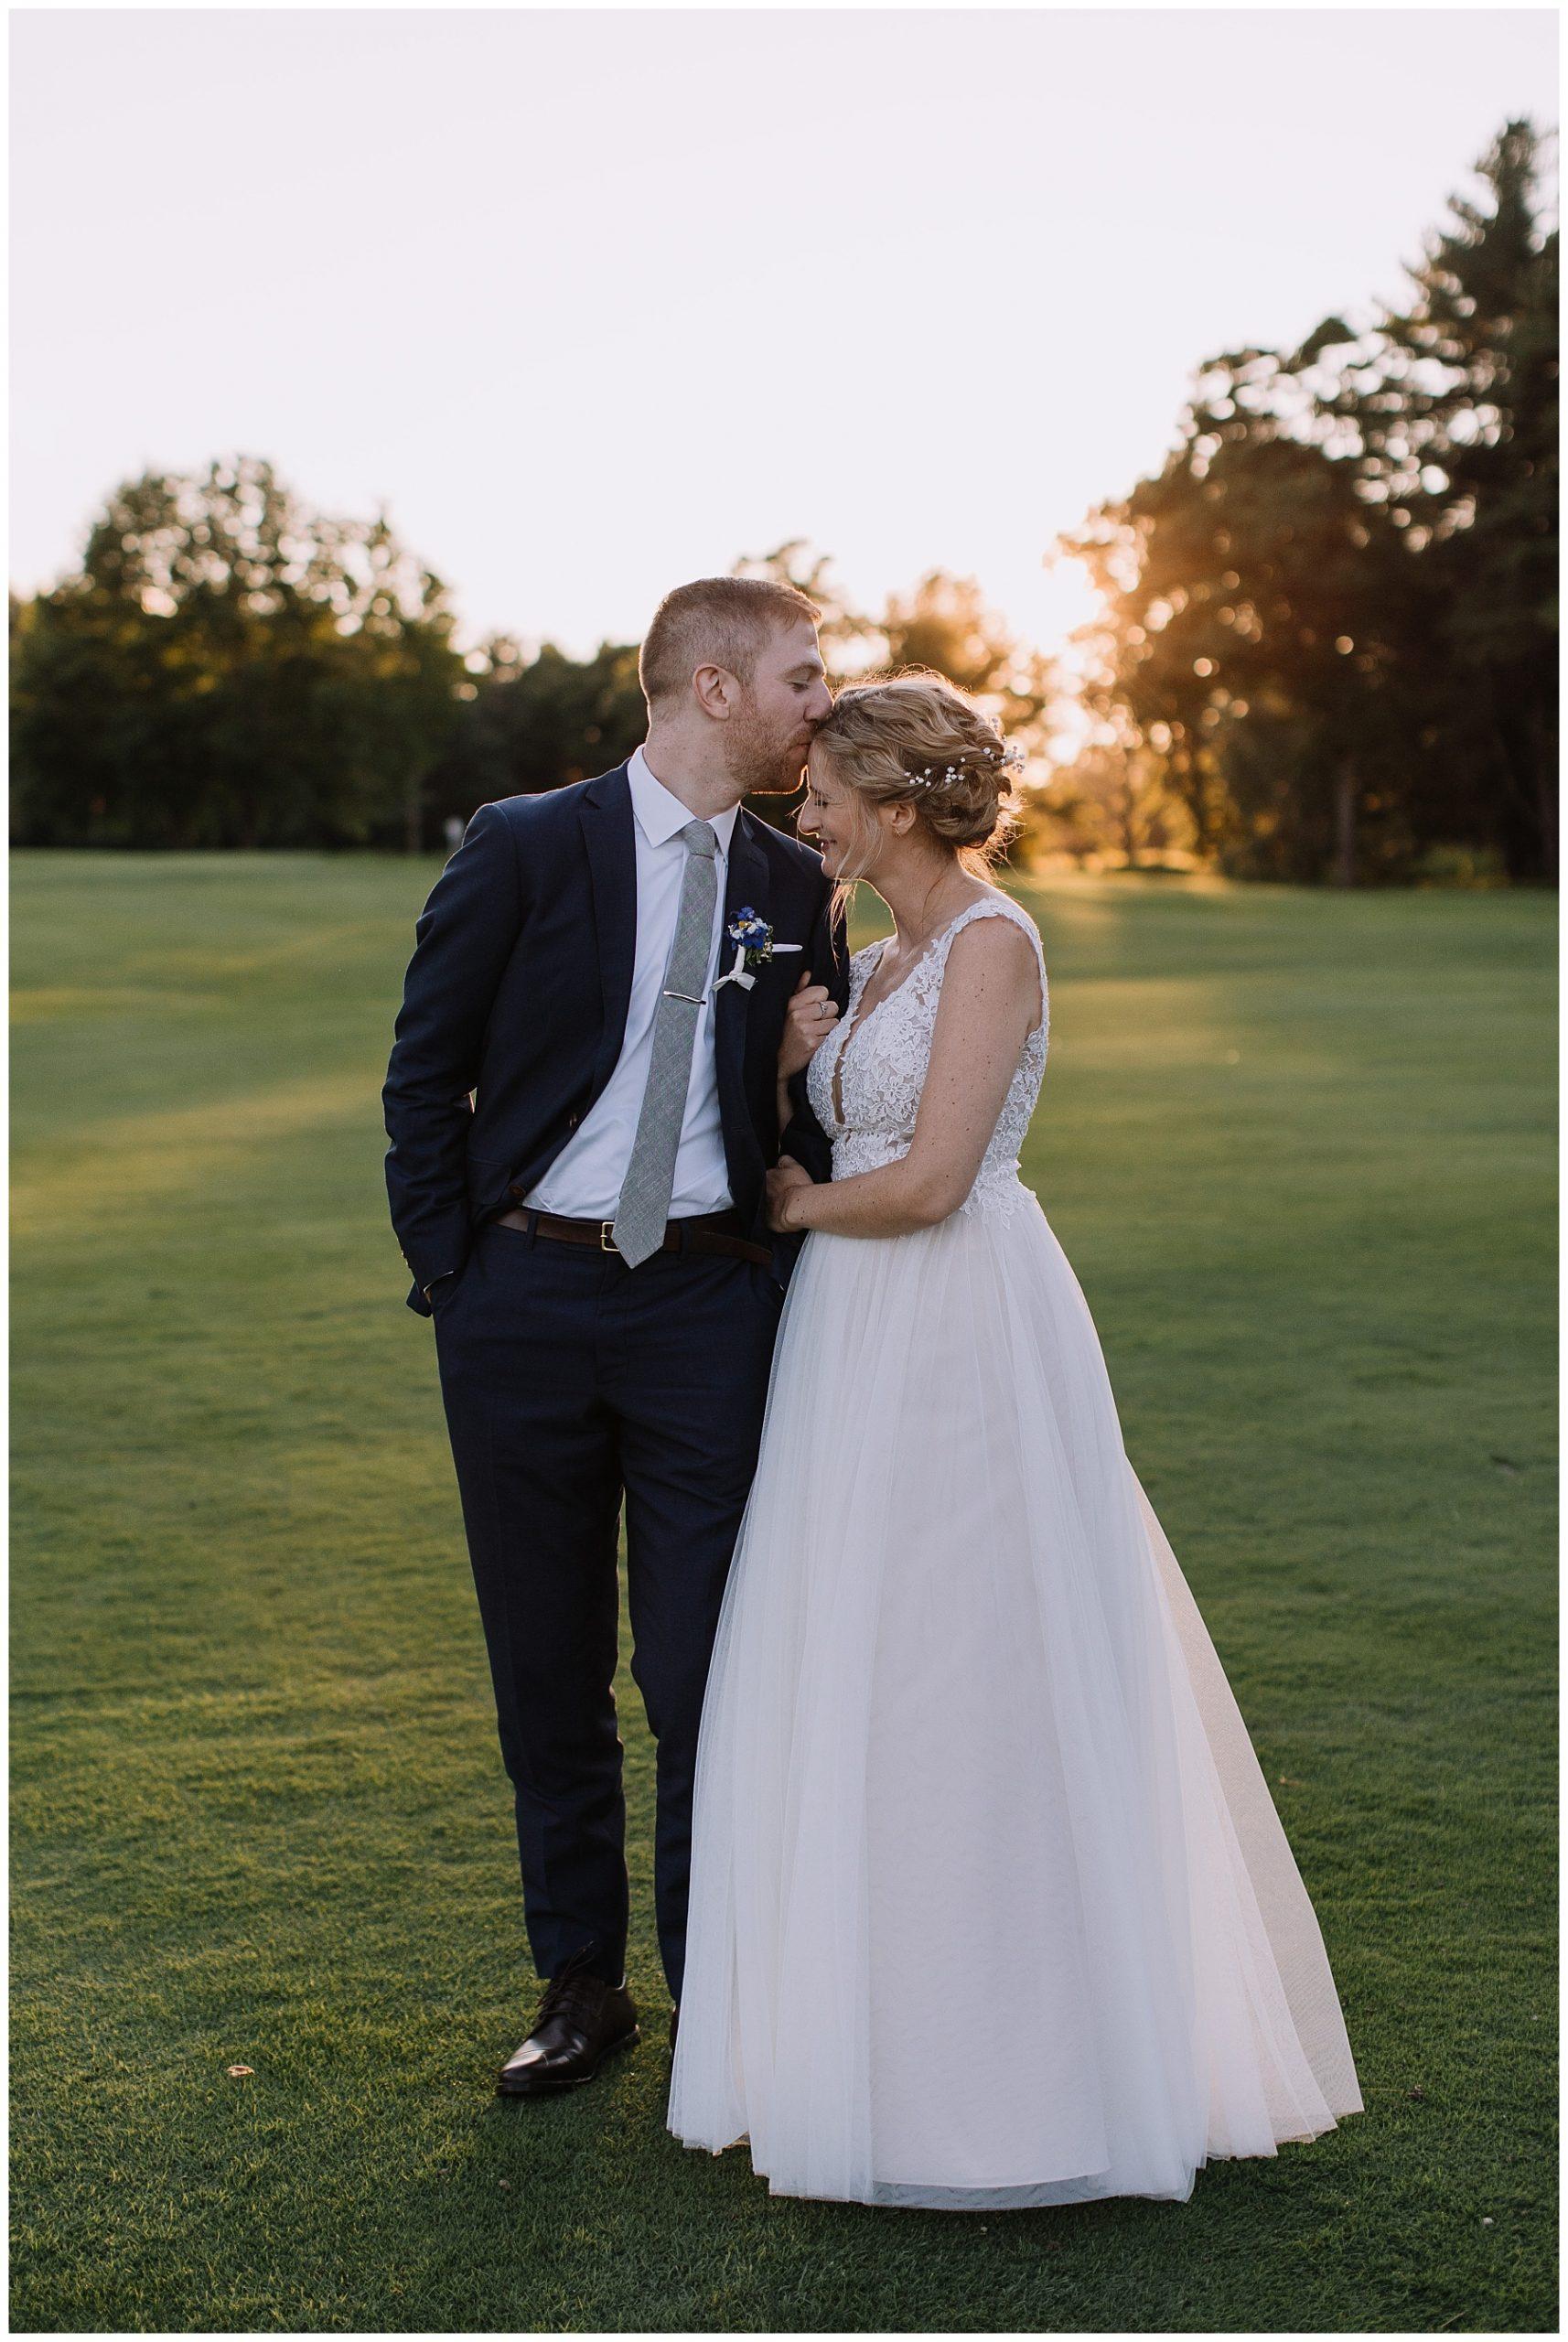 York Golf and Tennis Club, Maine Wedding